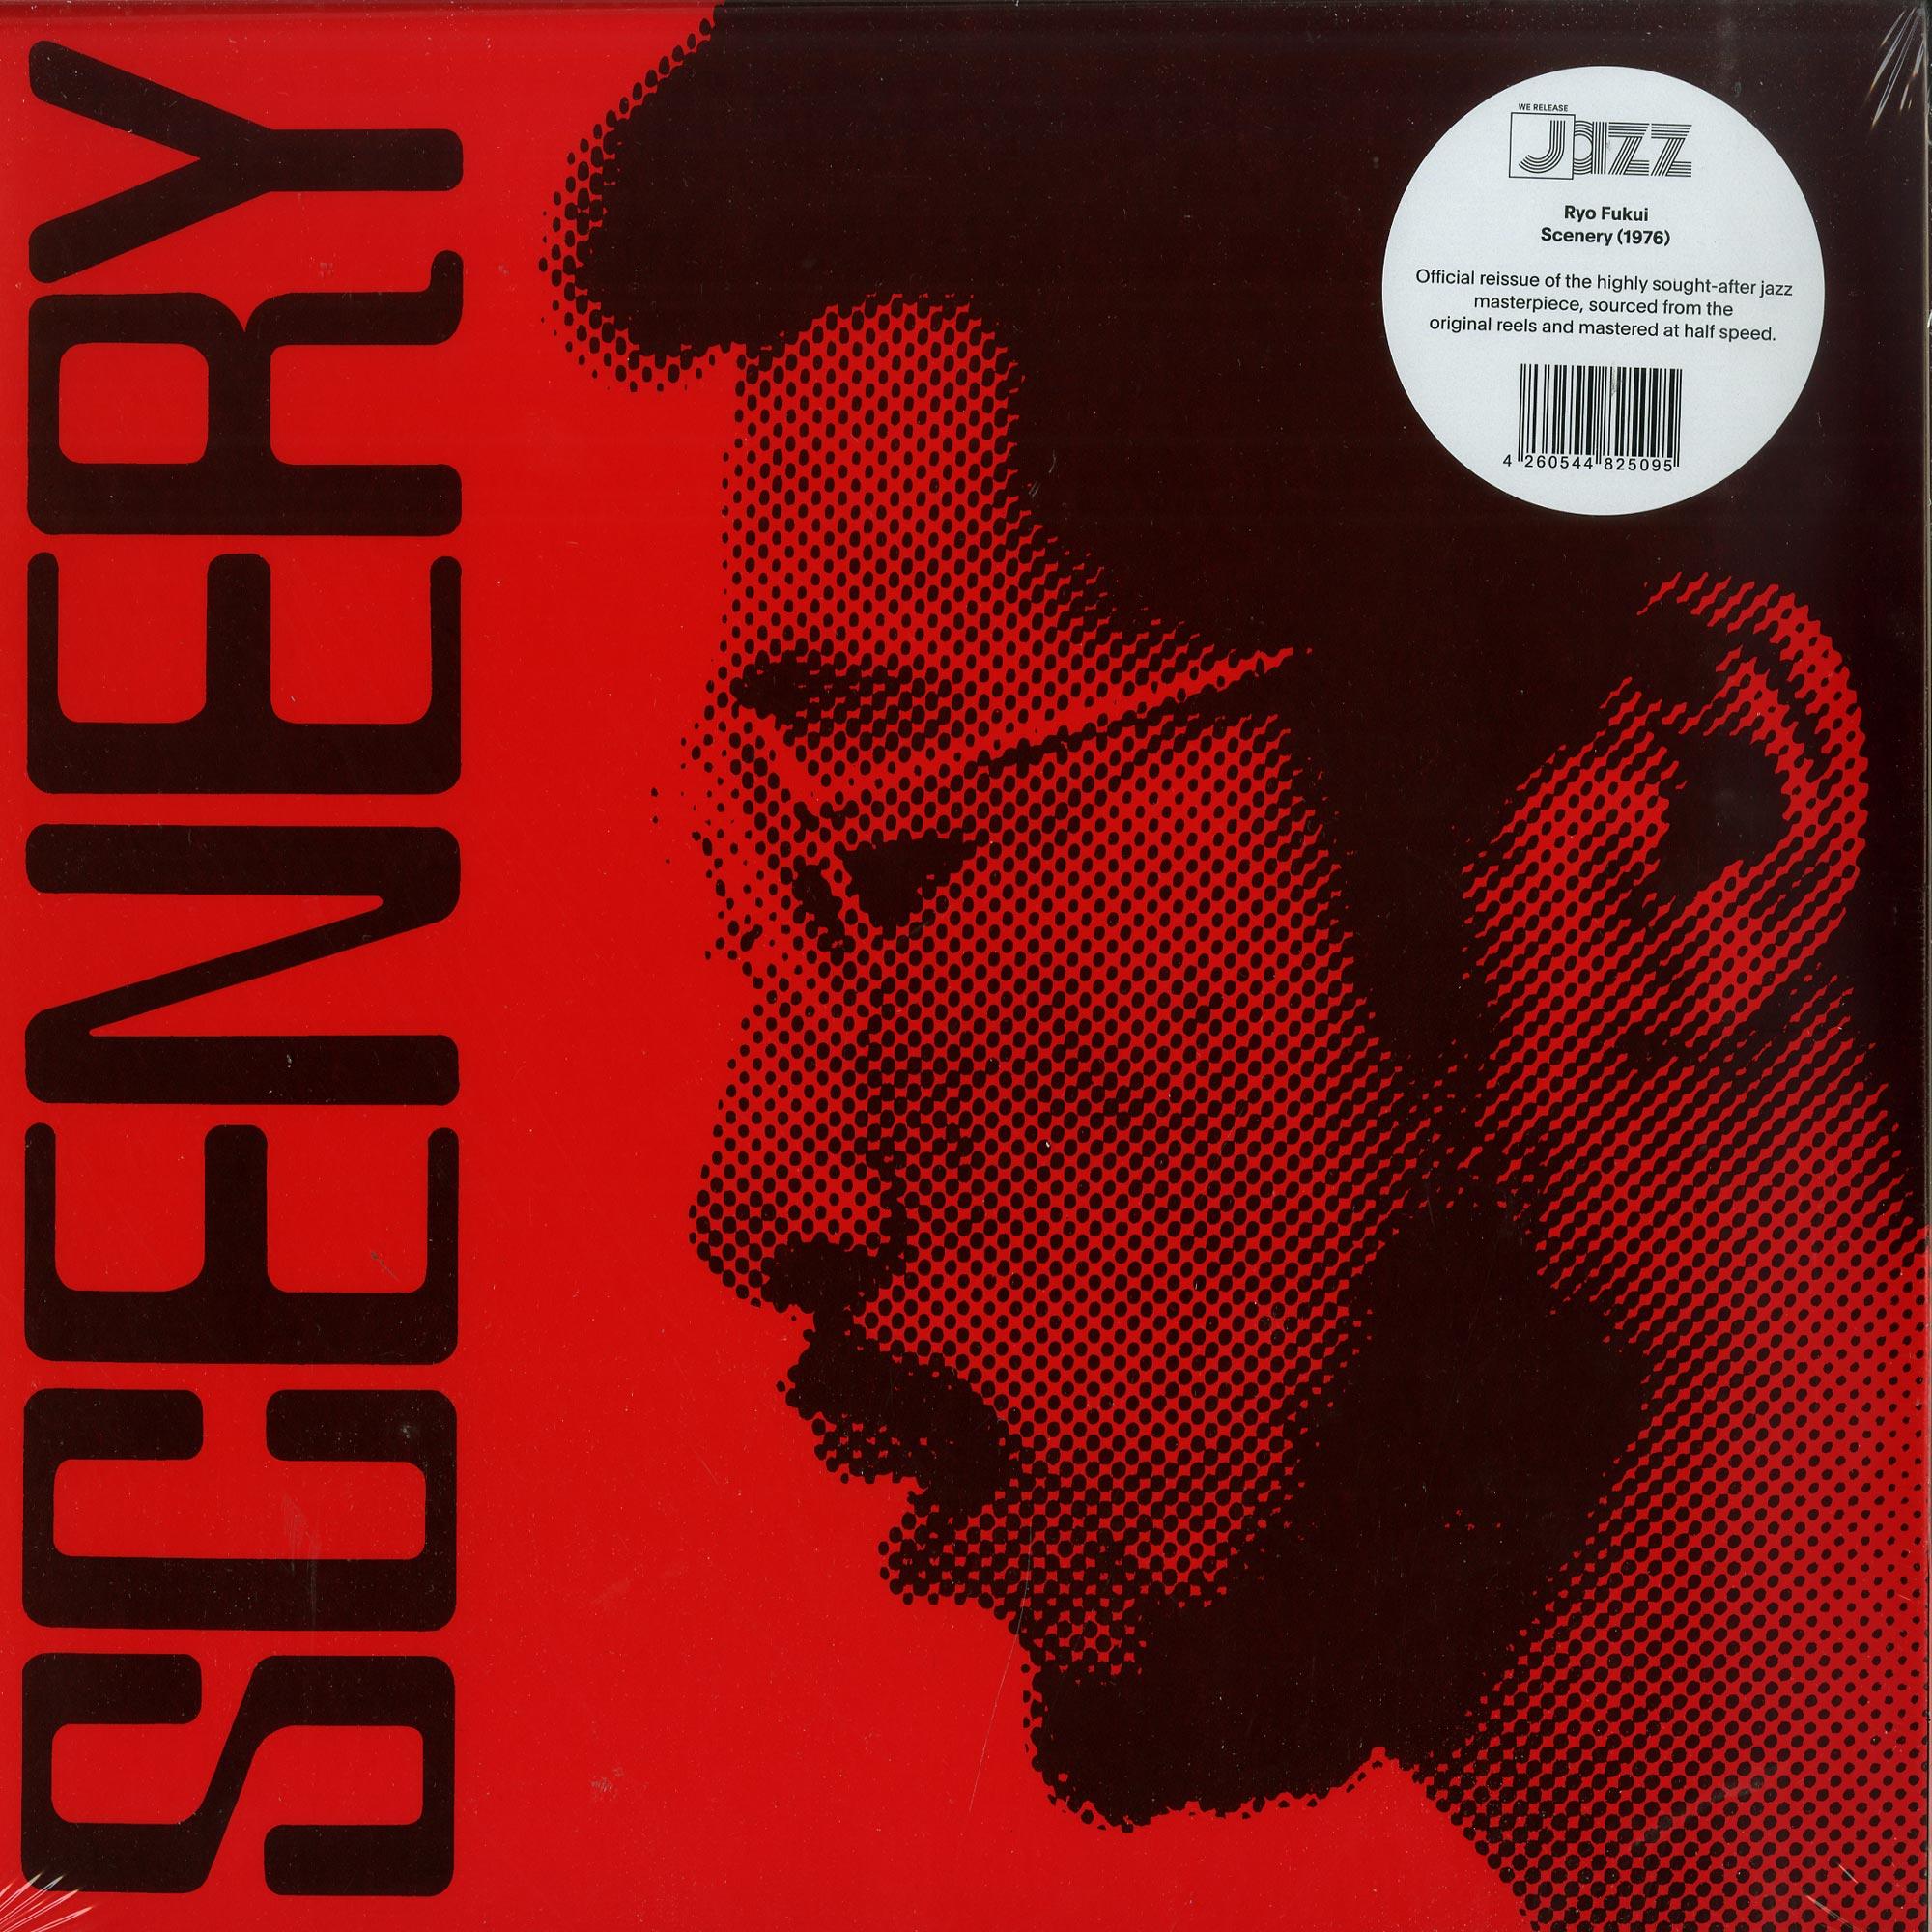 Ryo Fukui - SCENERY